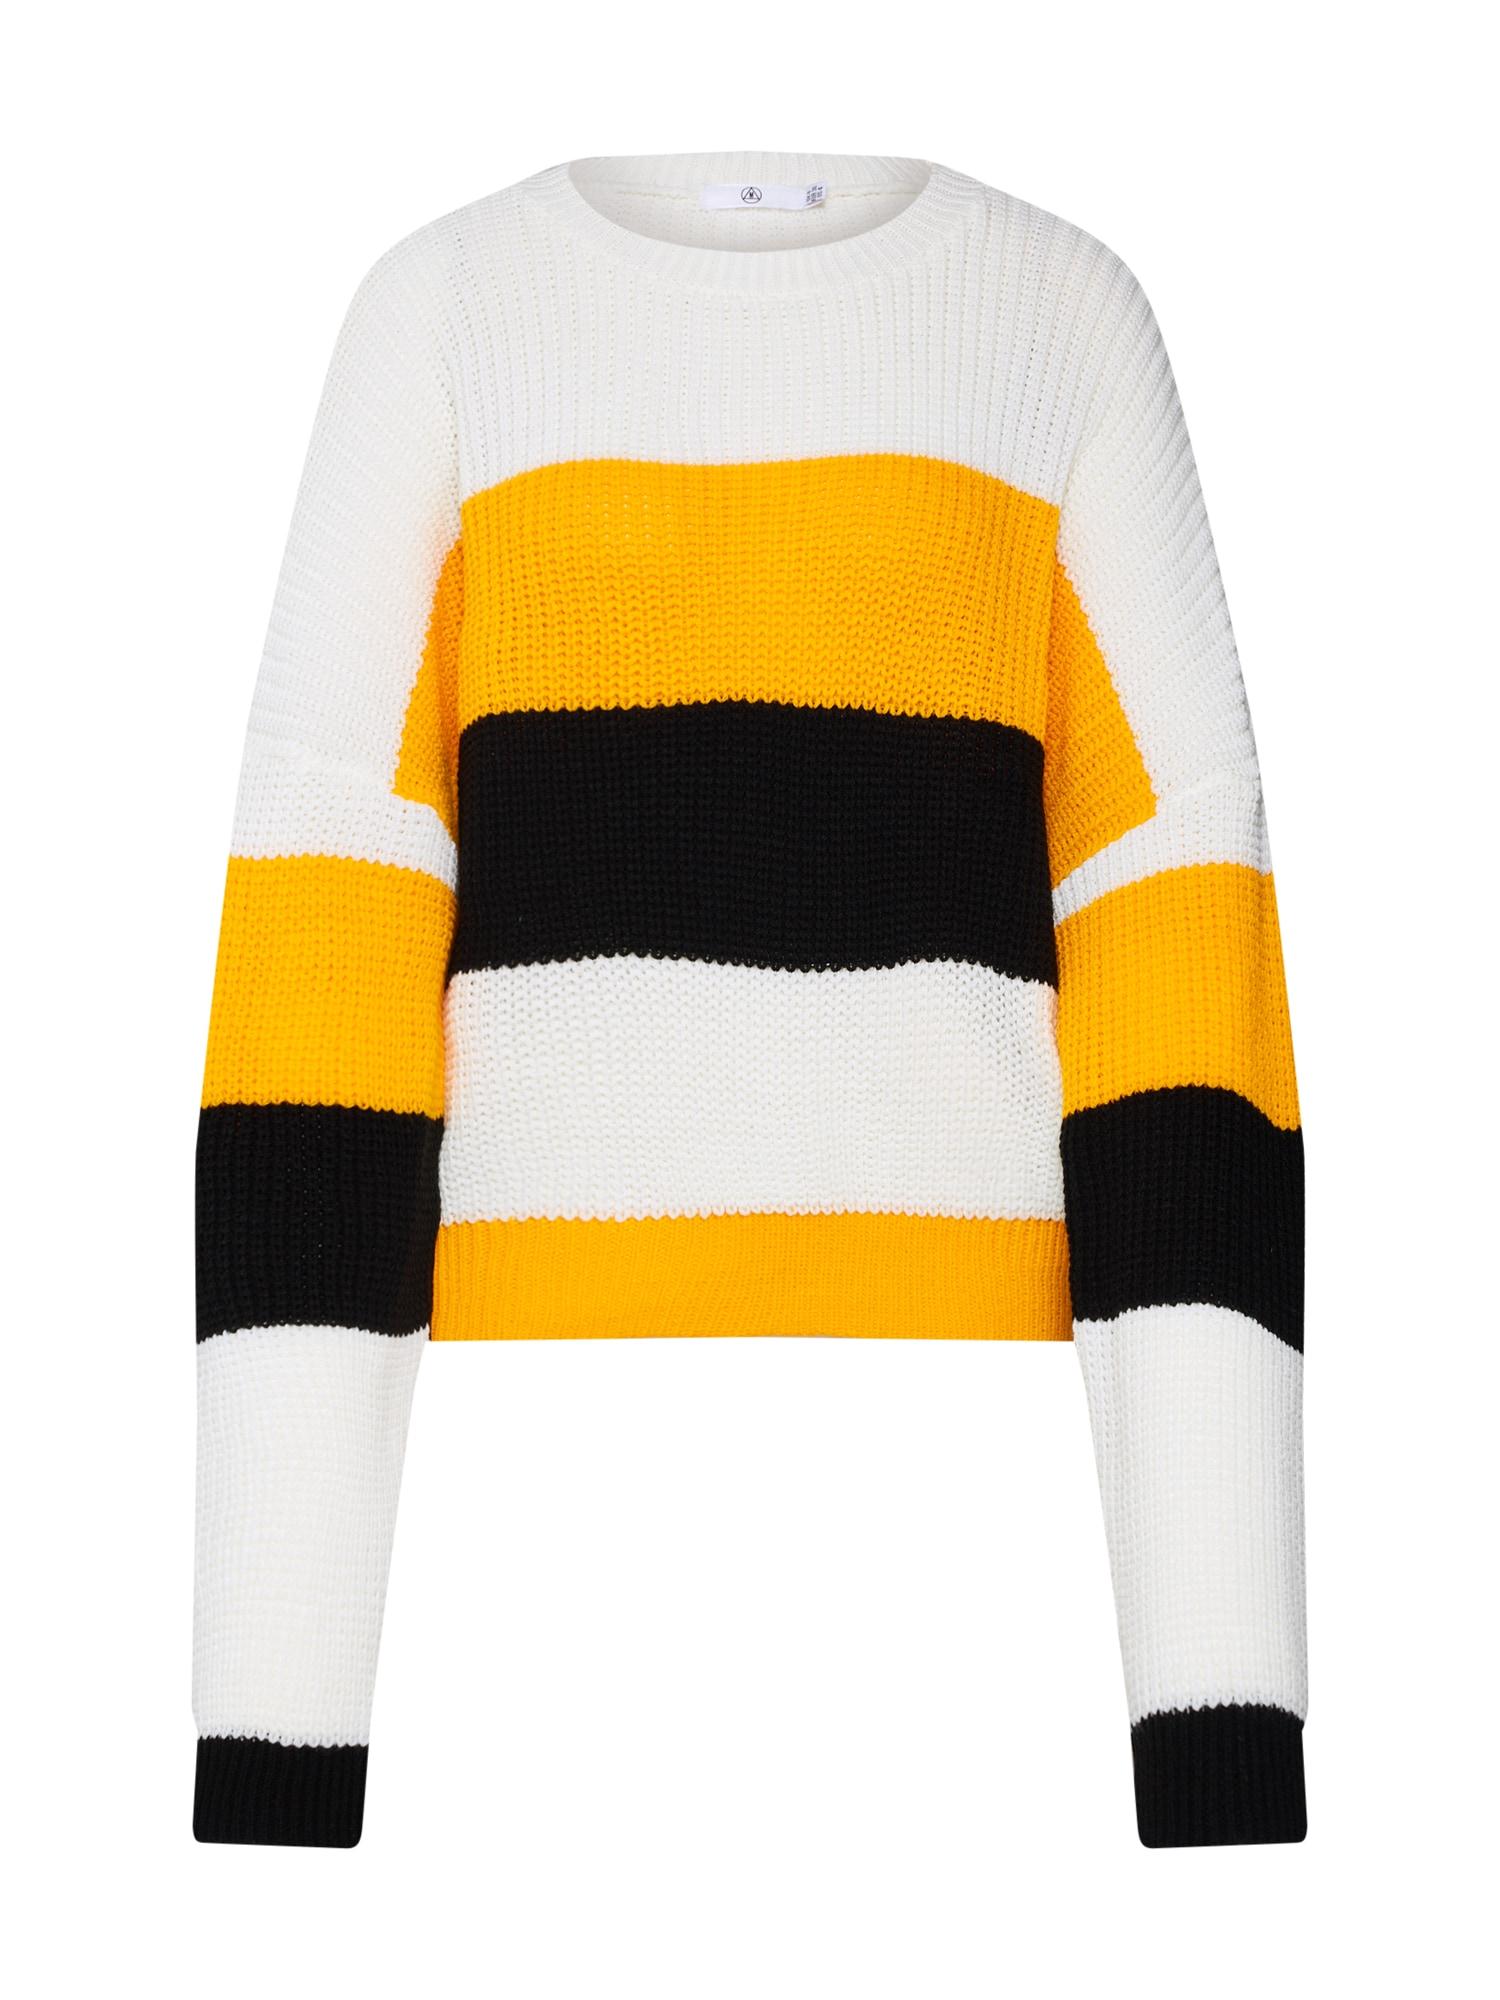 Maxi svetr COLOURBLOCK STRIPED OVERSIZED JUMPER žlutá černá bílá Missguided